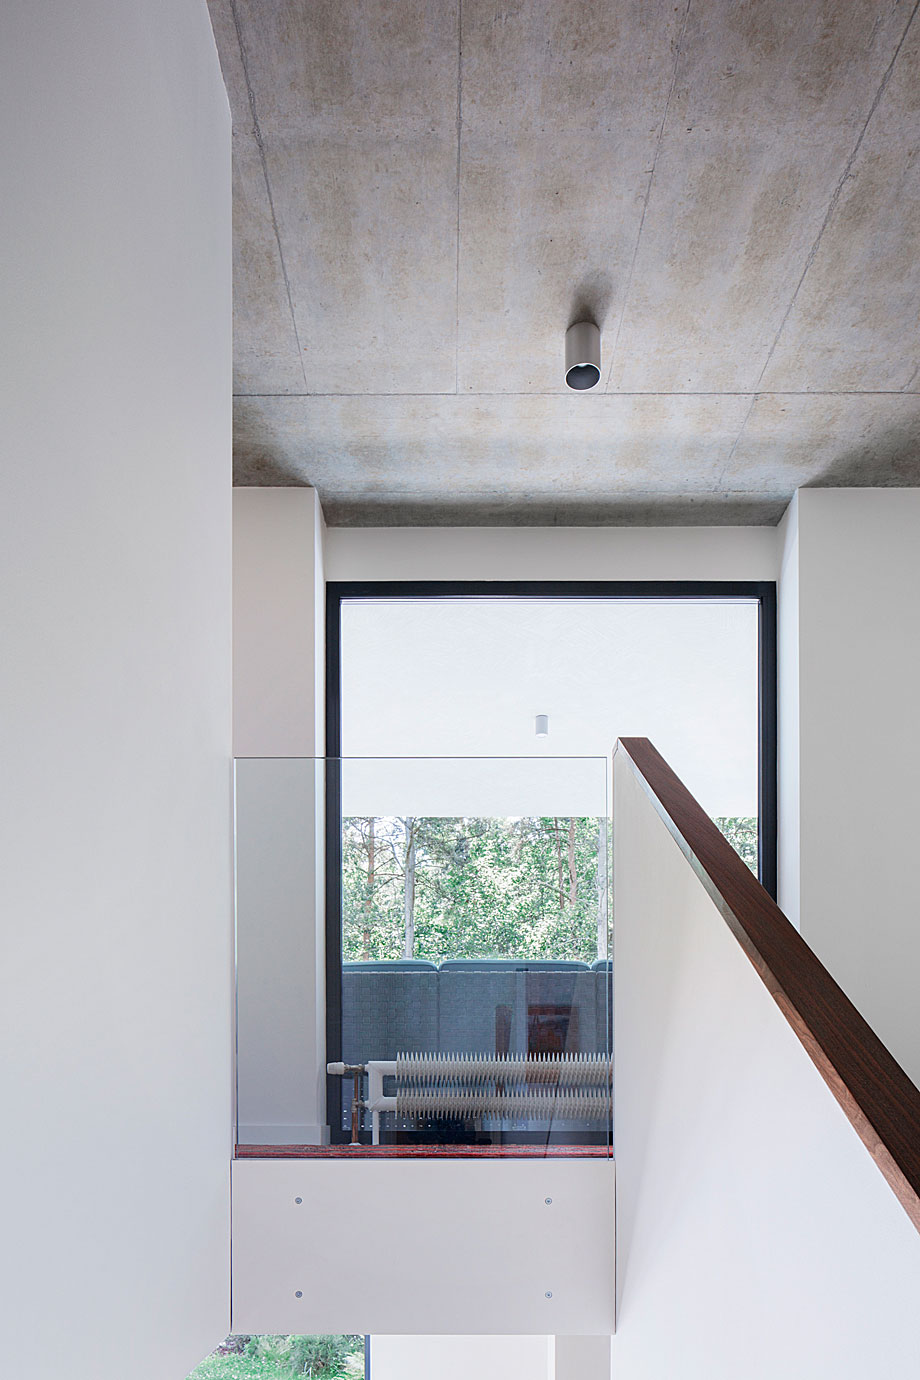 casa-unifamiliar-klanovice-adr-architects-10